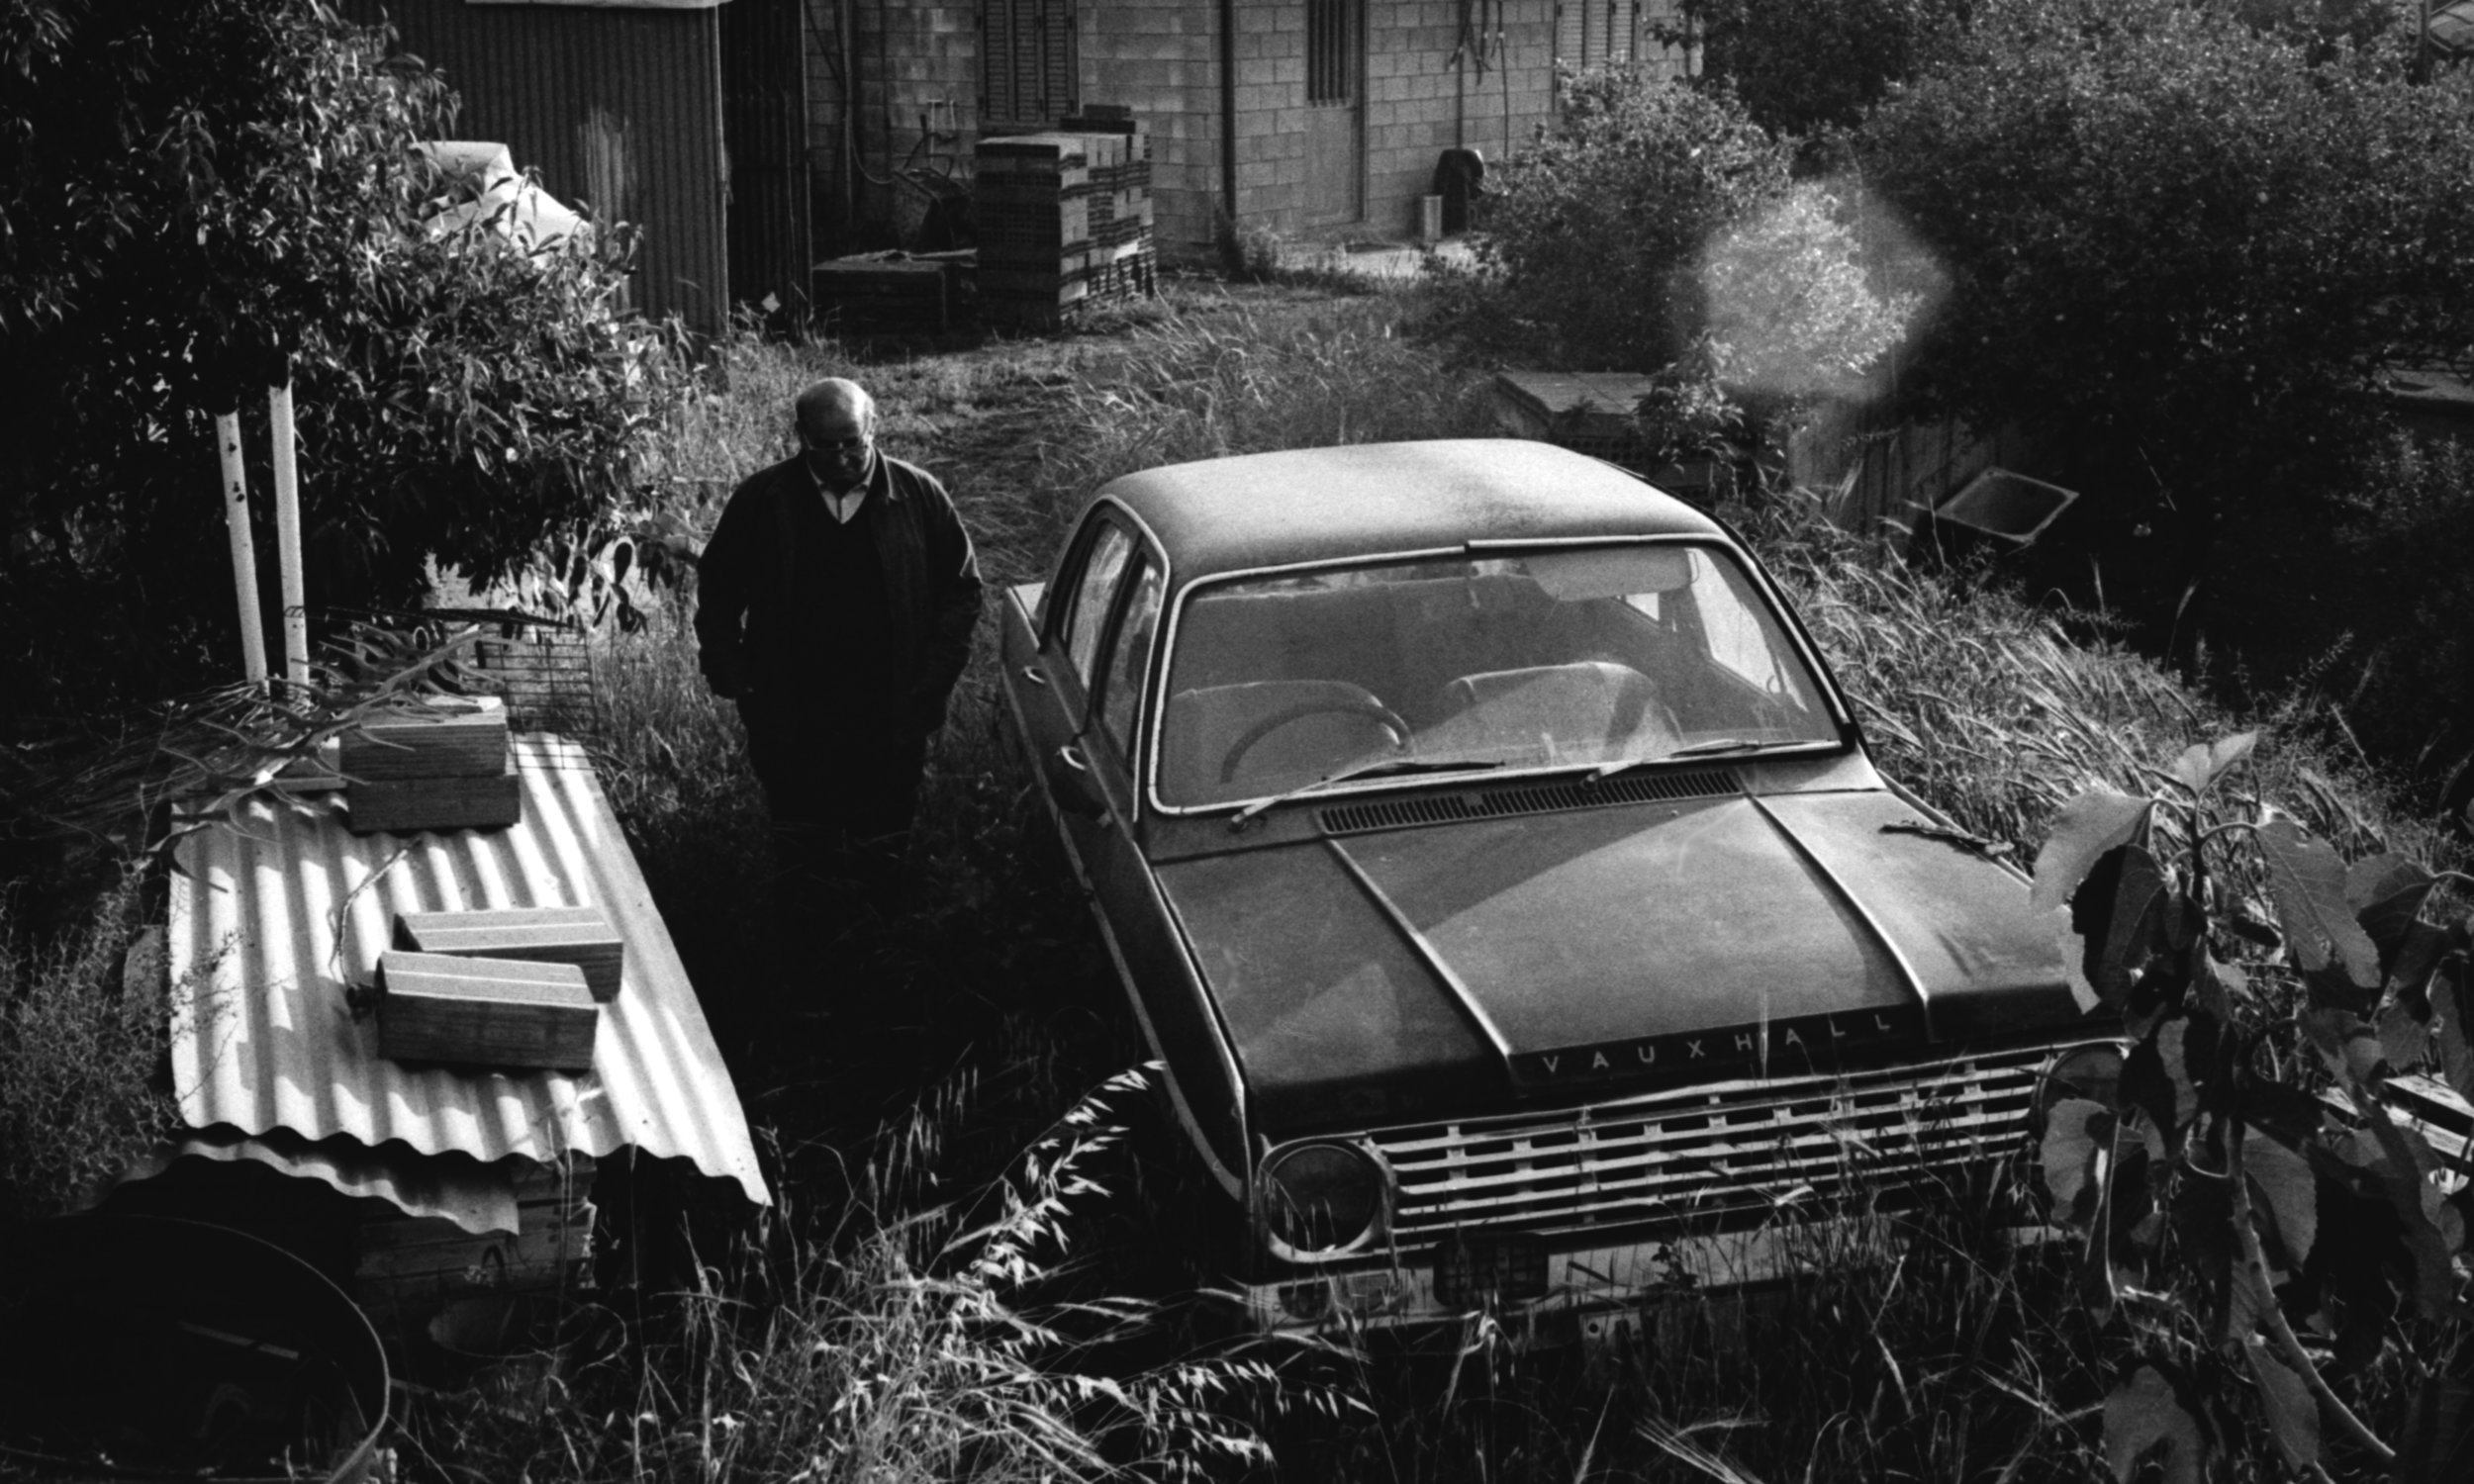 Kris_Vauxhall.jpg